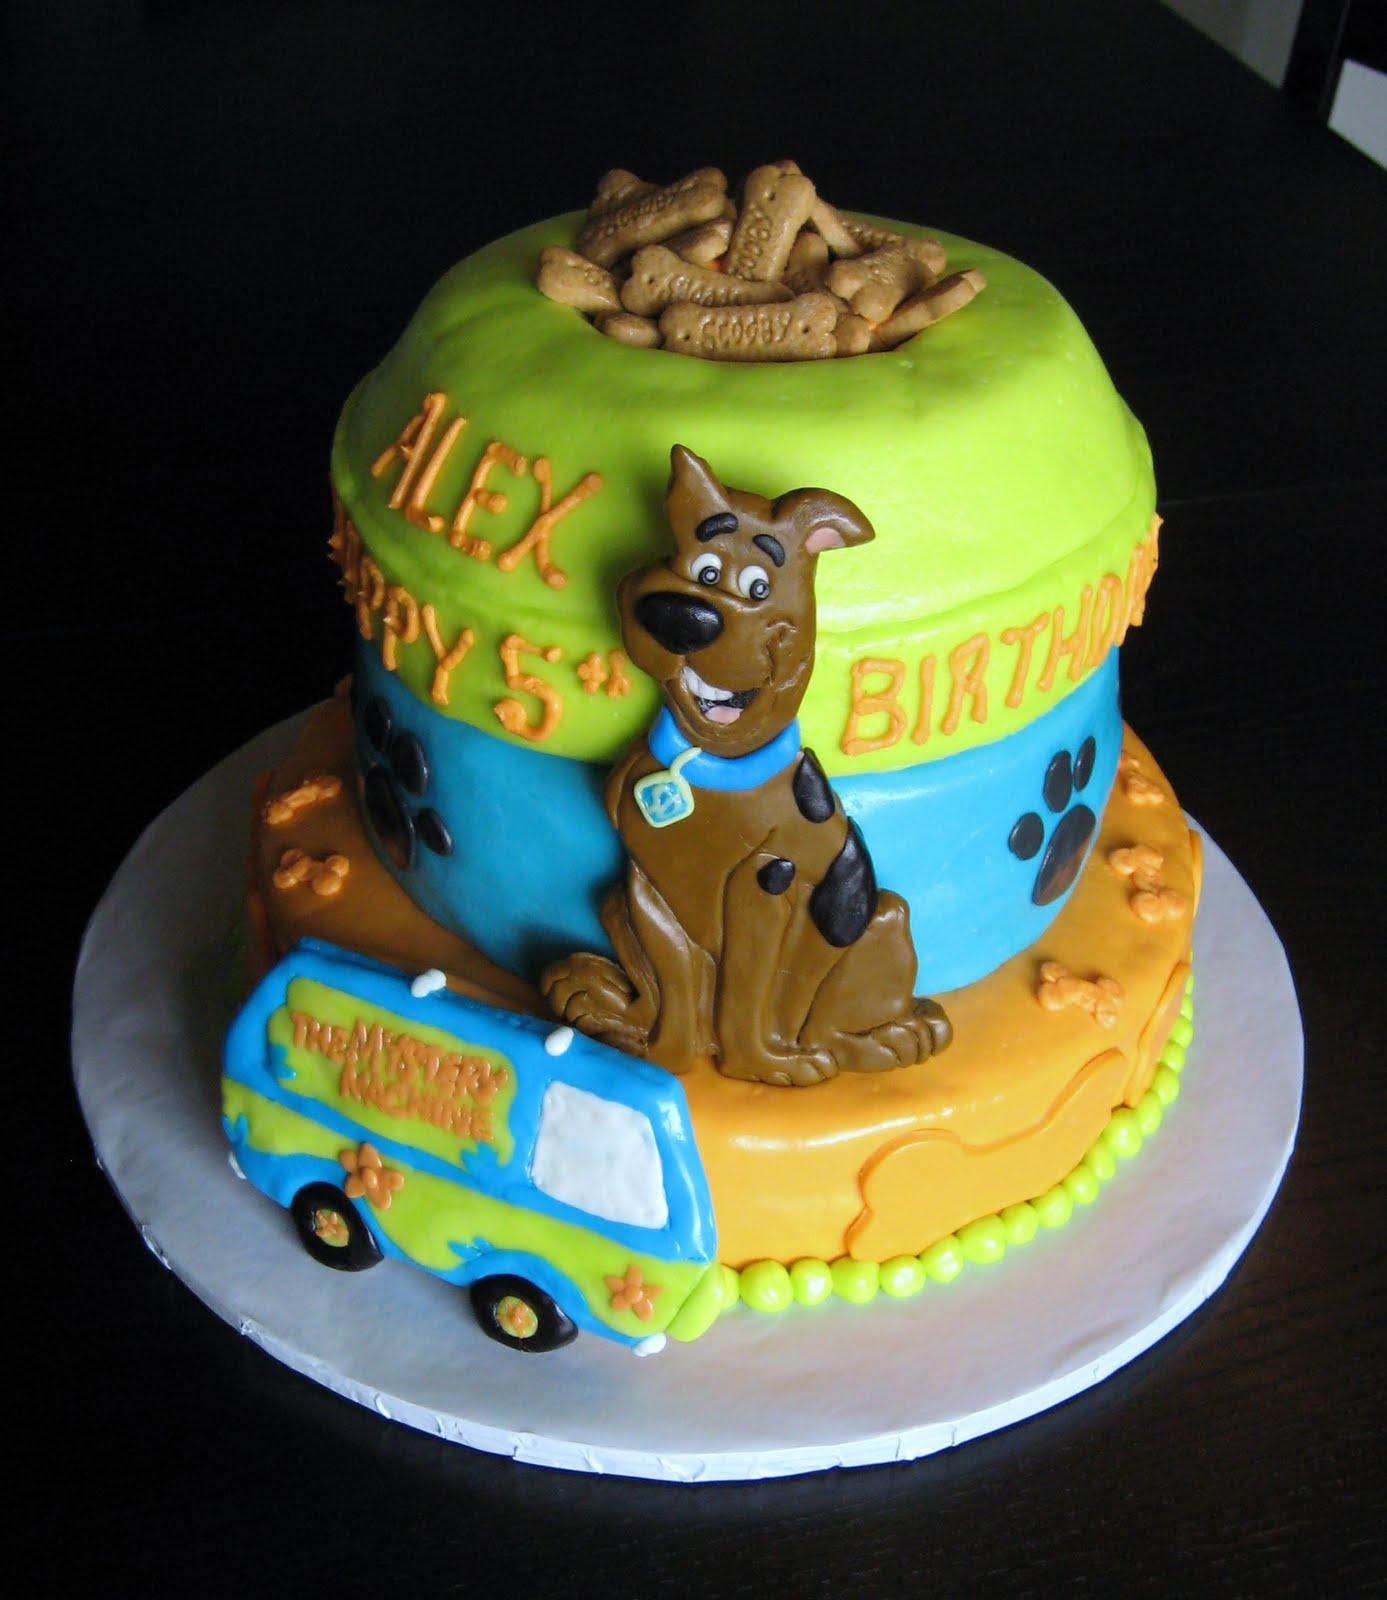 Pleasing Scooby Doo Cakes Decoration Ideas Little Birthday Cakes Funny Birthday Cards Online Alyptdamsfinfo